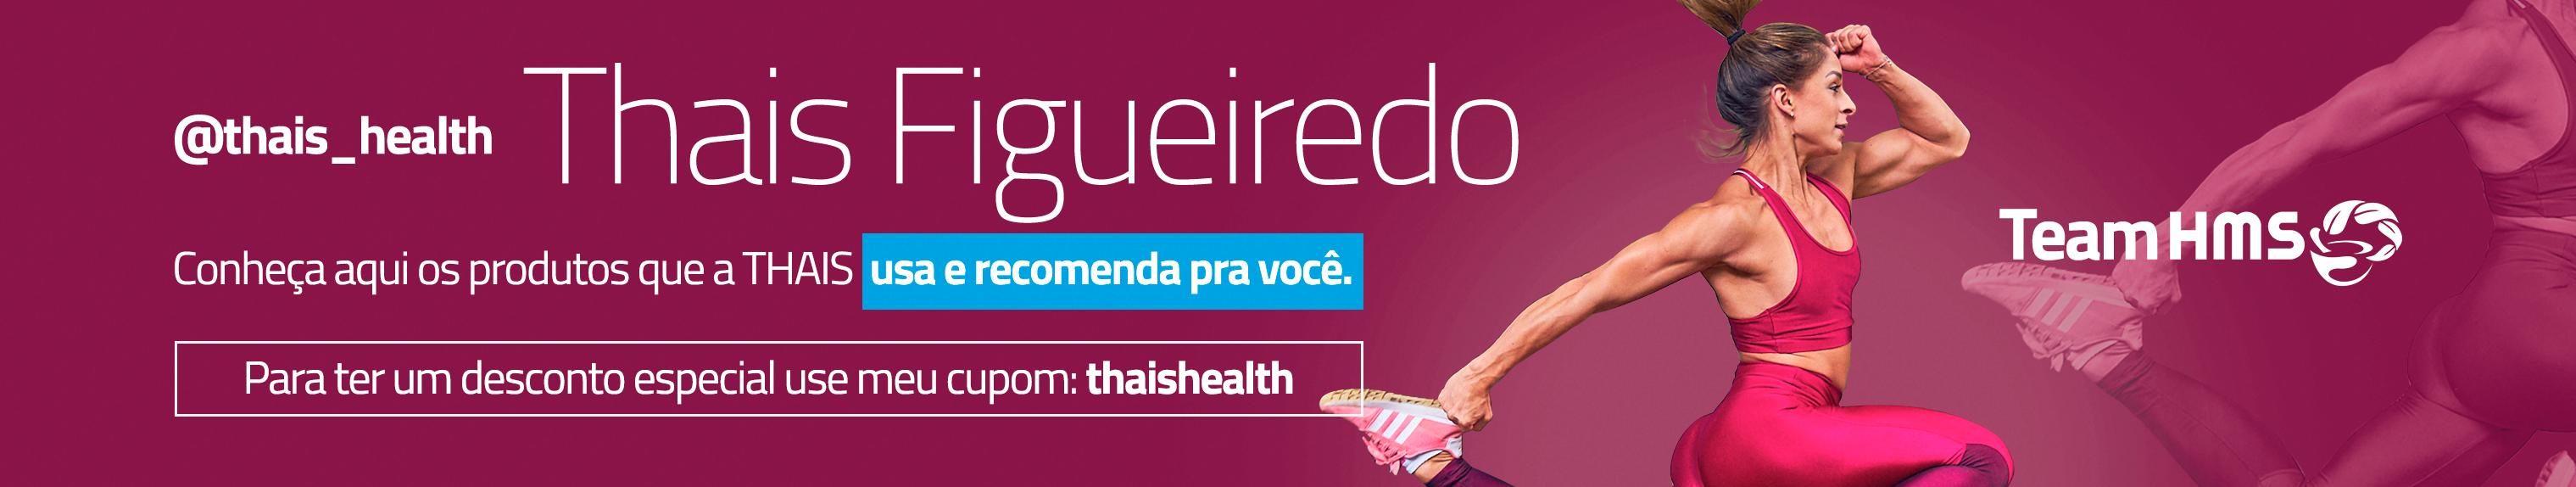 banner_influencer_thais_health